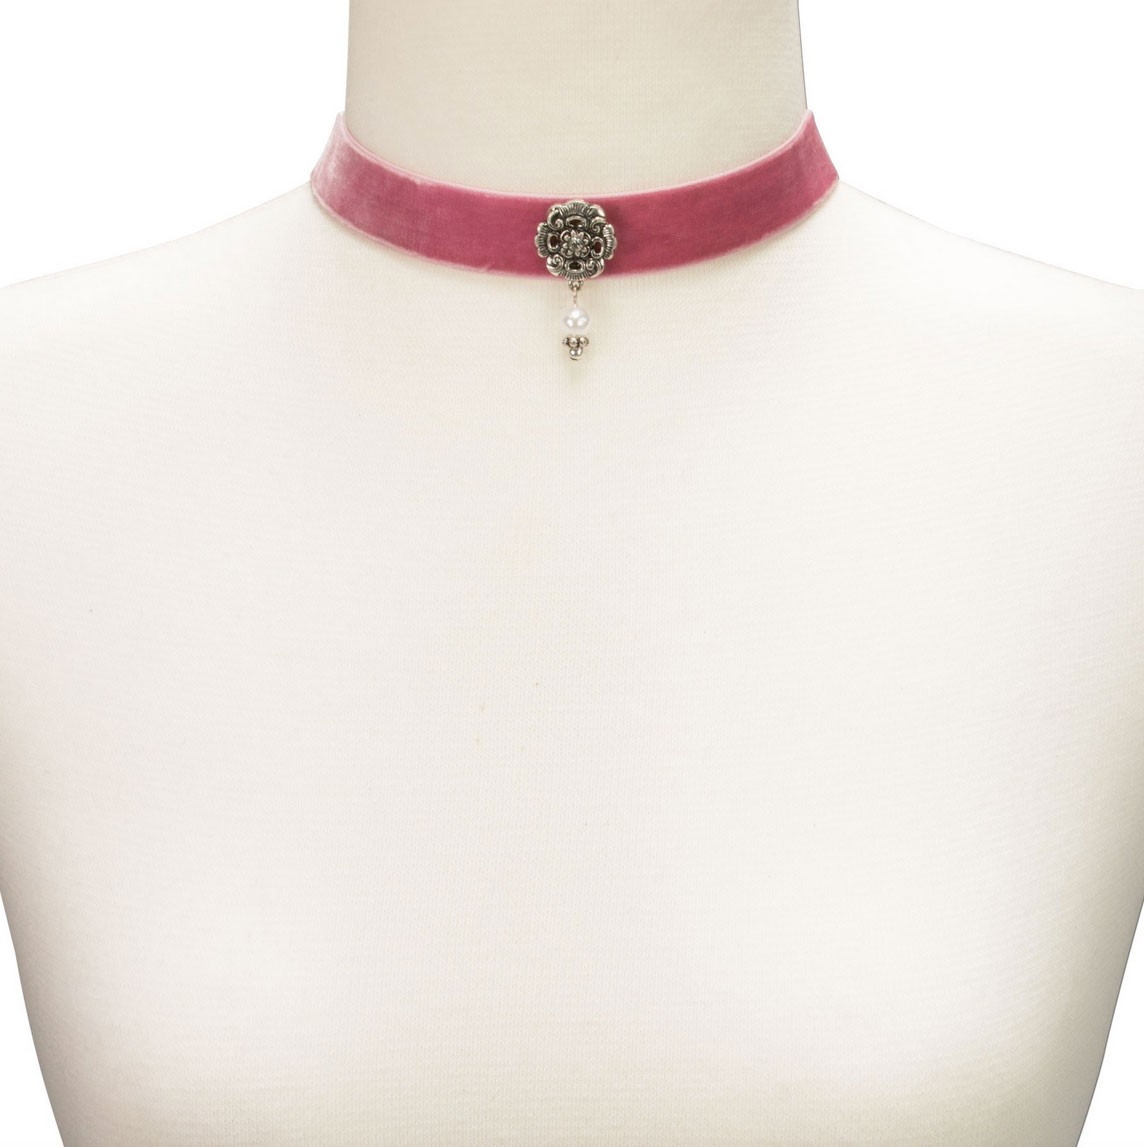 Trachten Kropfband mit Ornament rosa